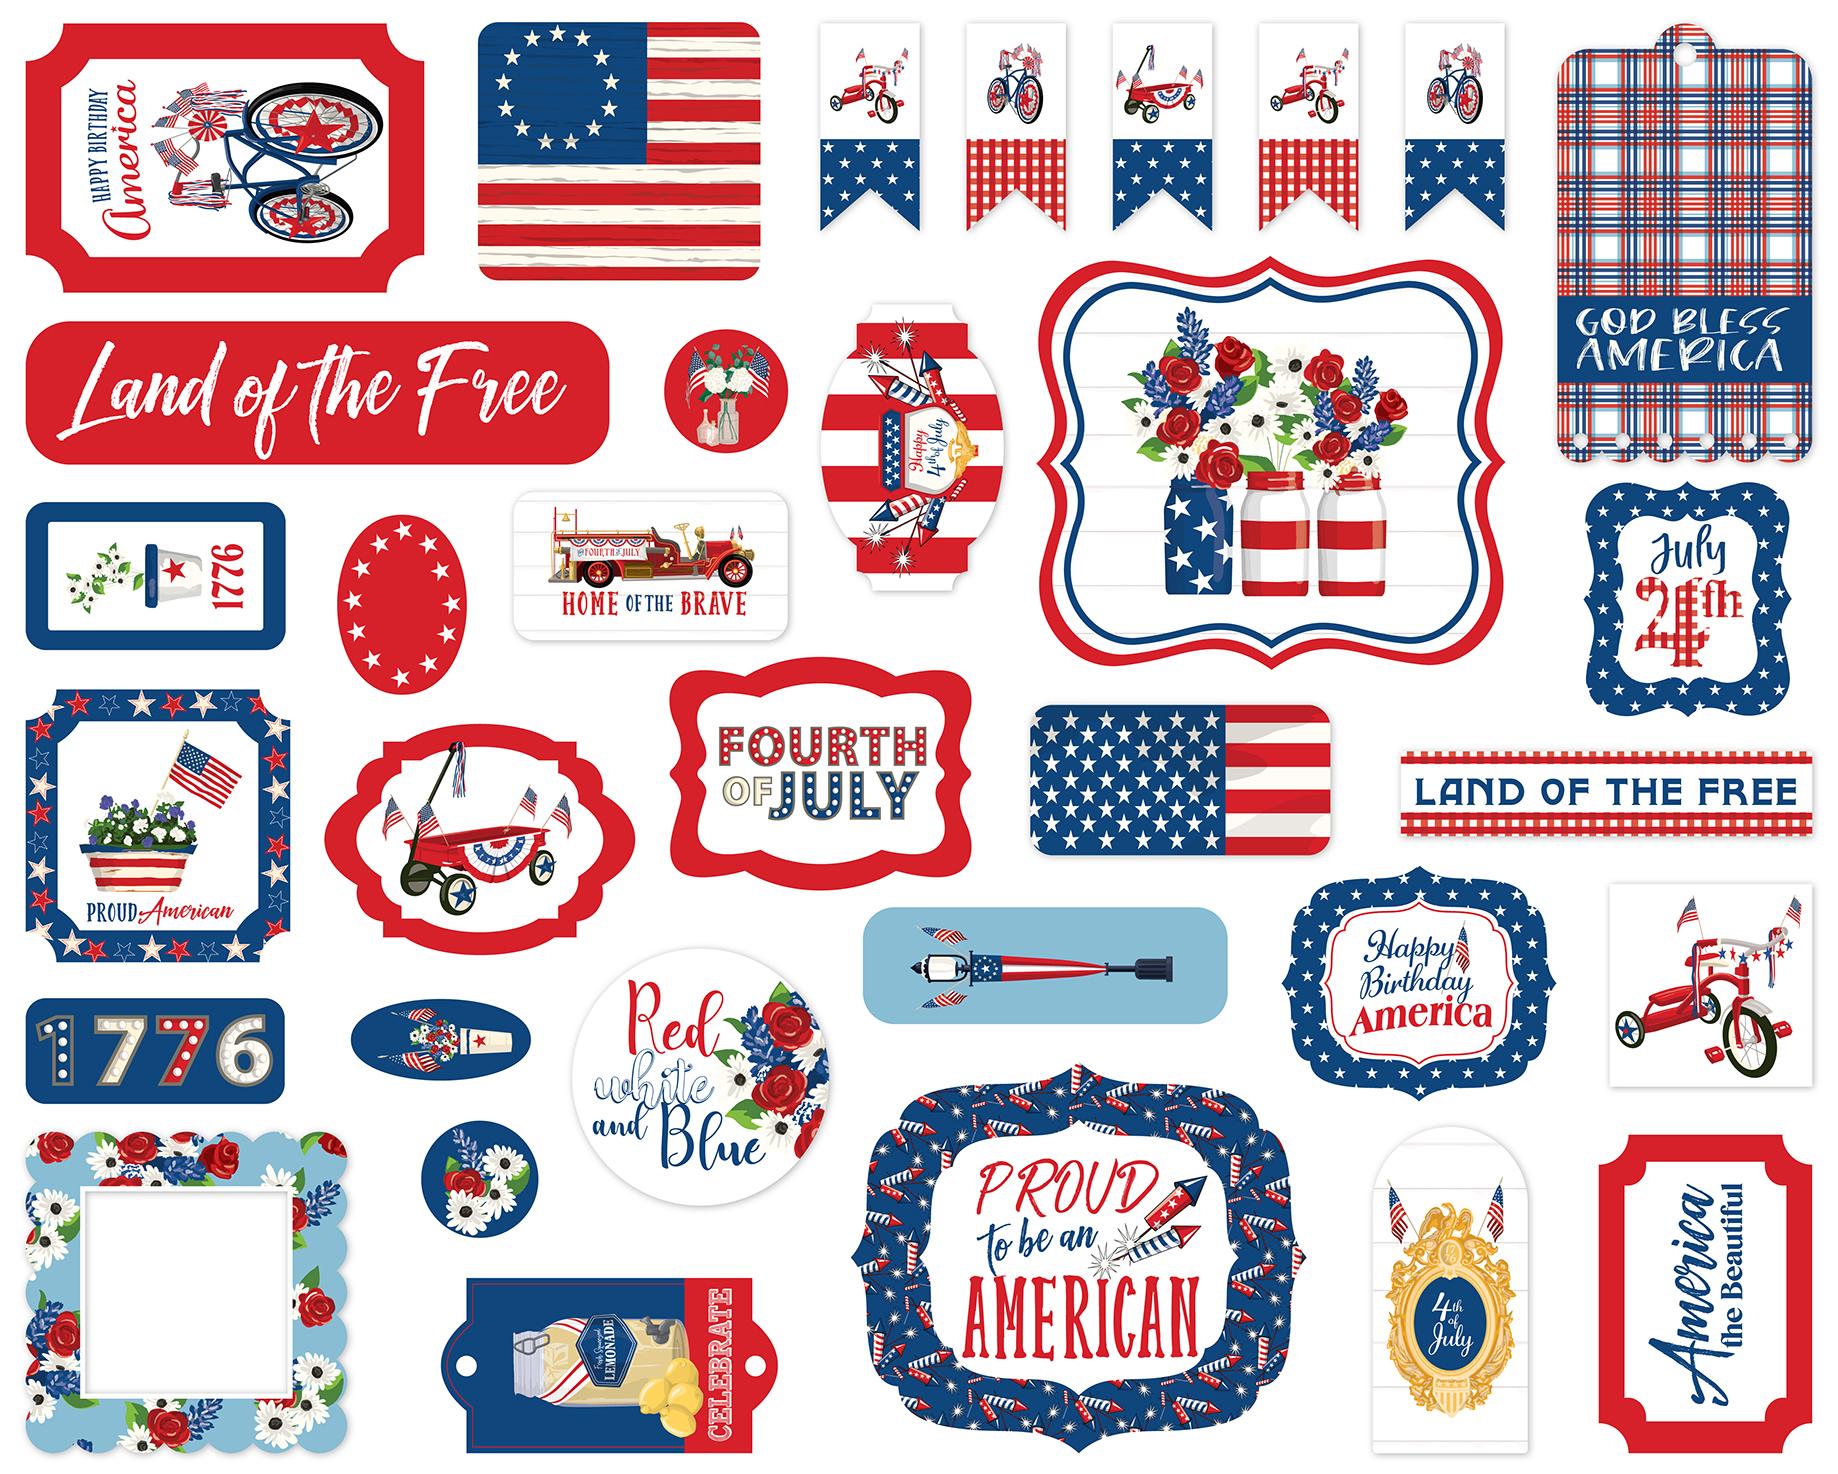 God Bless America: God Bless America Ephemera